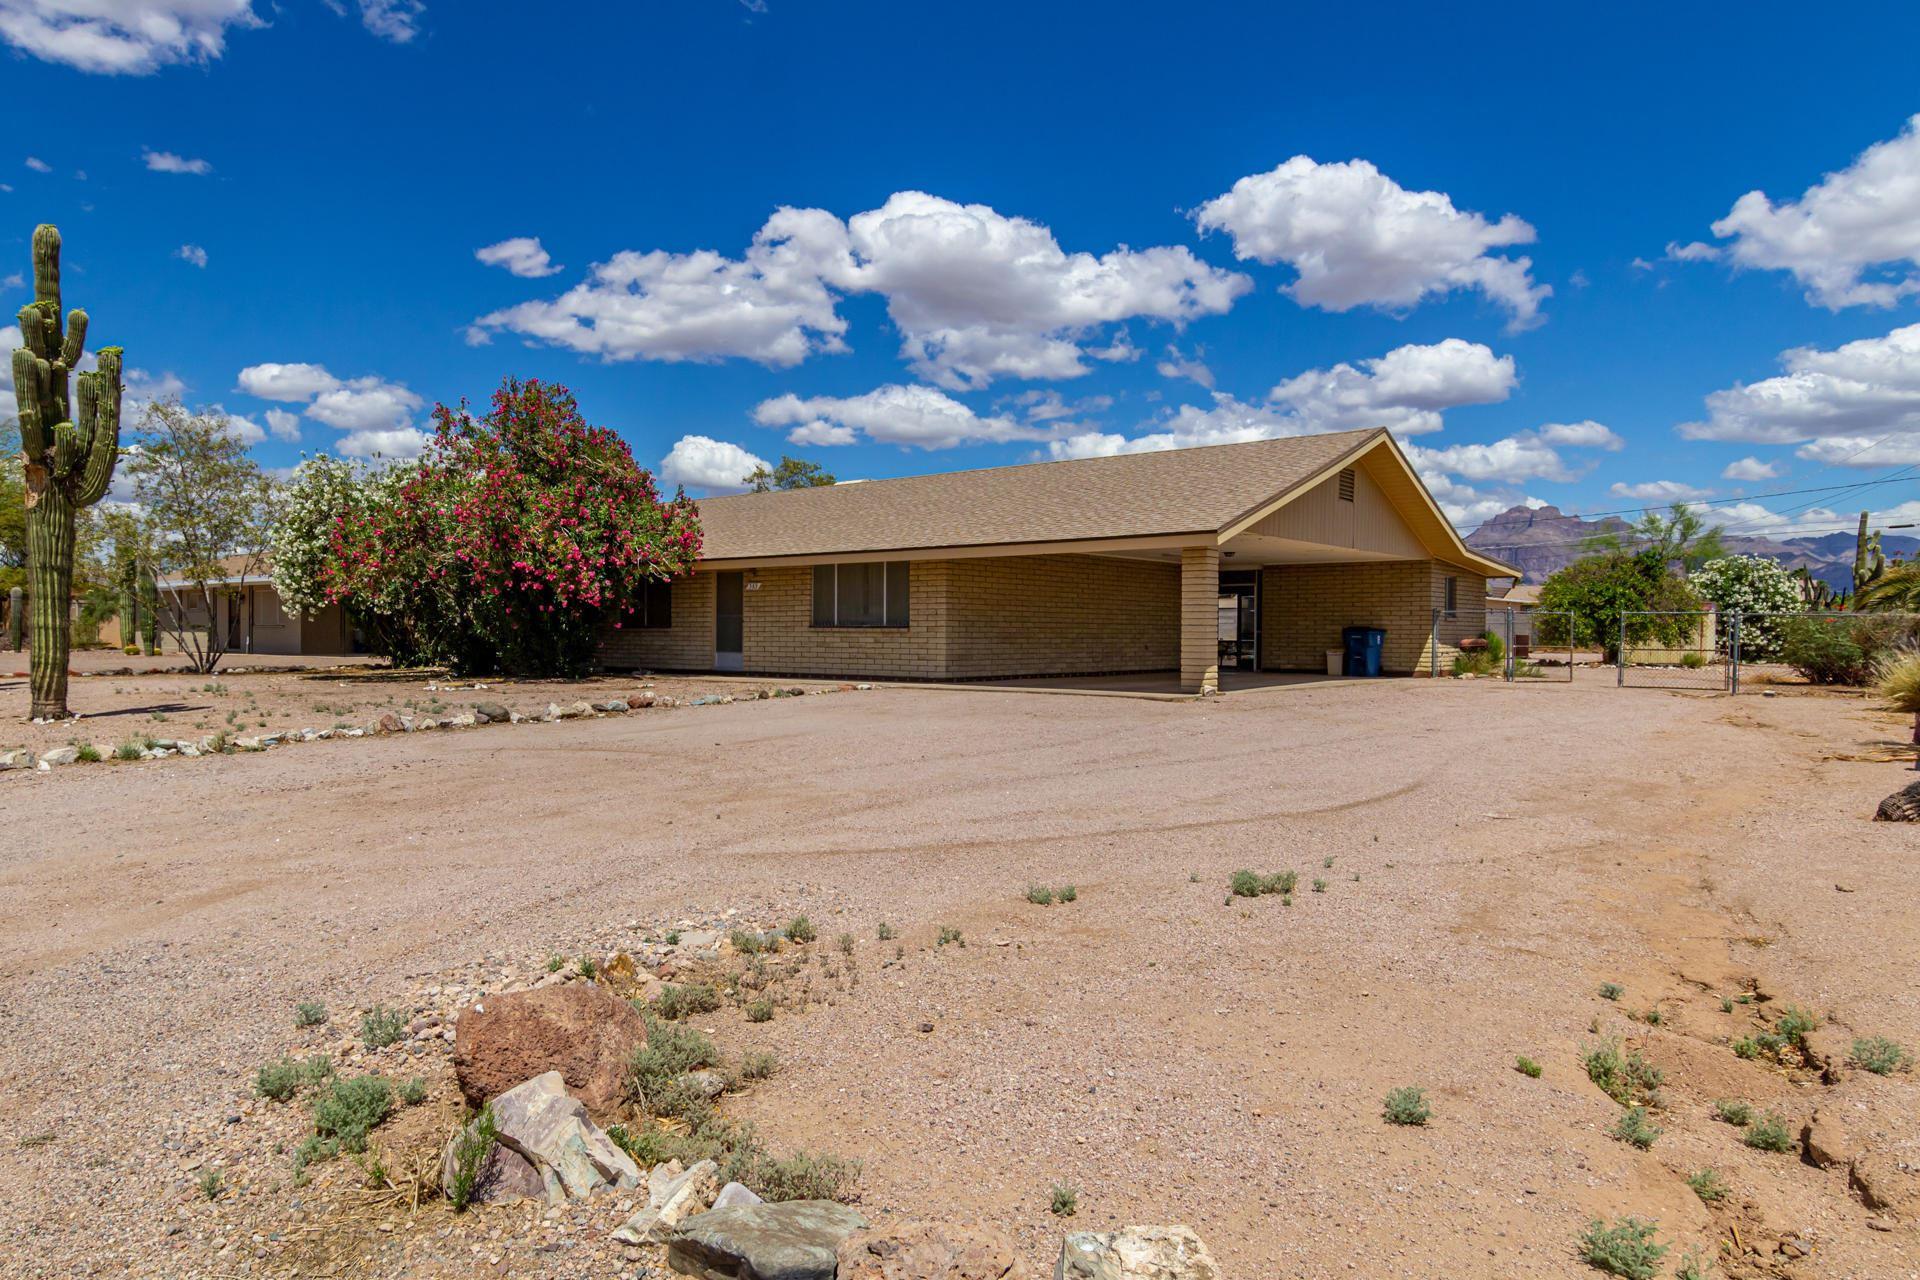 Photo of 589 N THUNDERBIRD Drive, Apache Junction, AZ 85120 (MLS # 6228030)